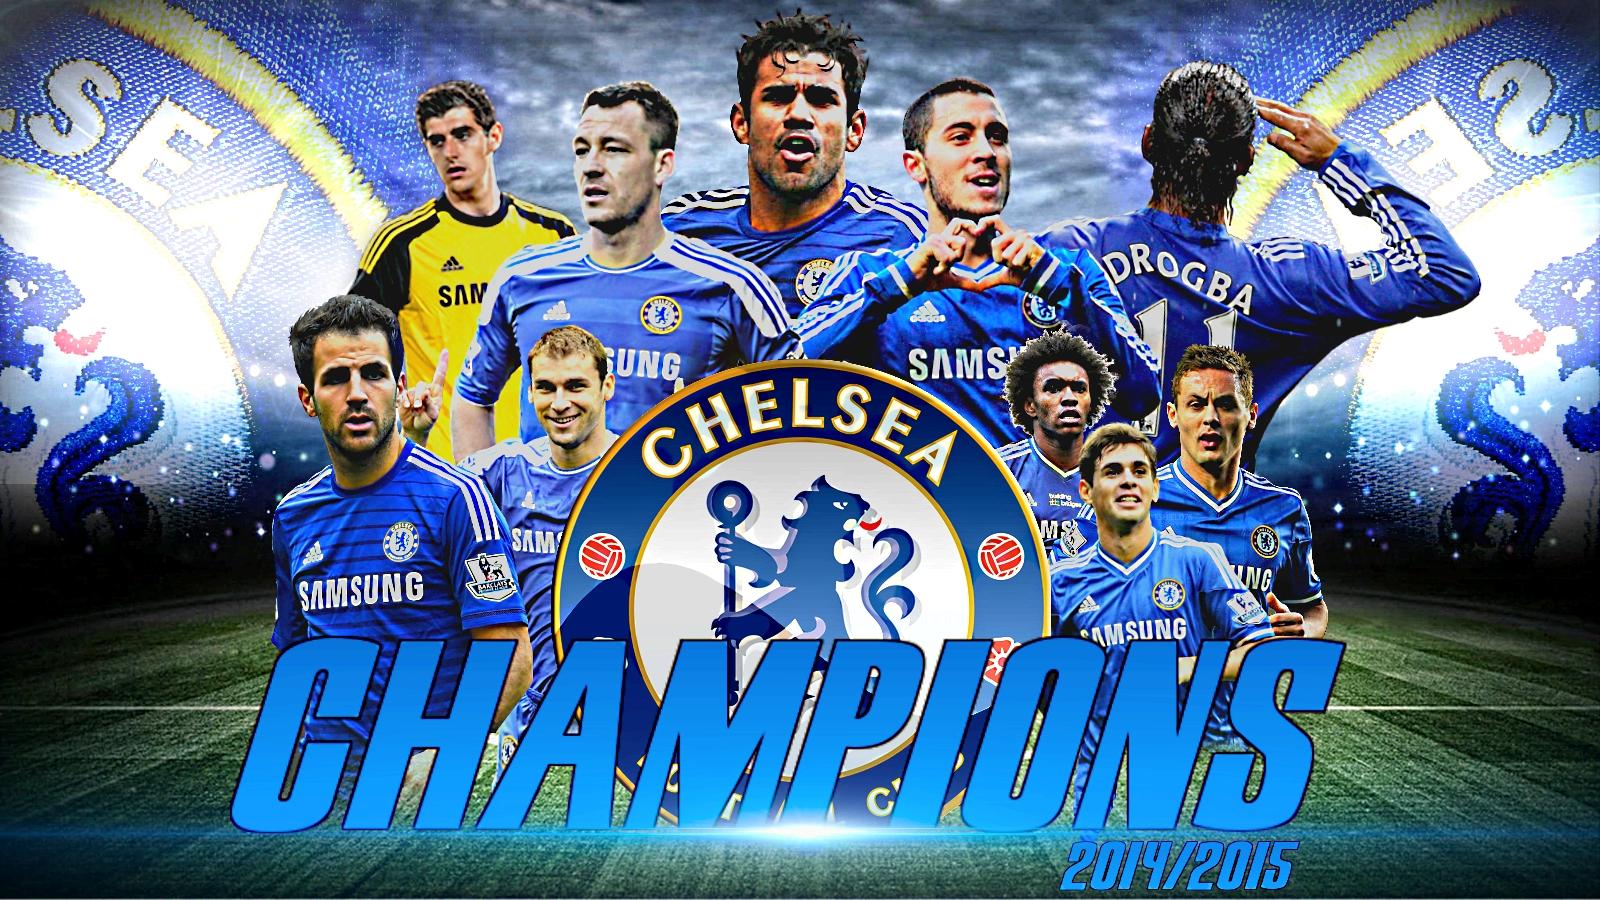 Chelsea F.C. 2015/2016